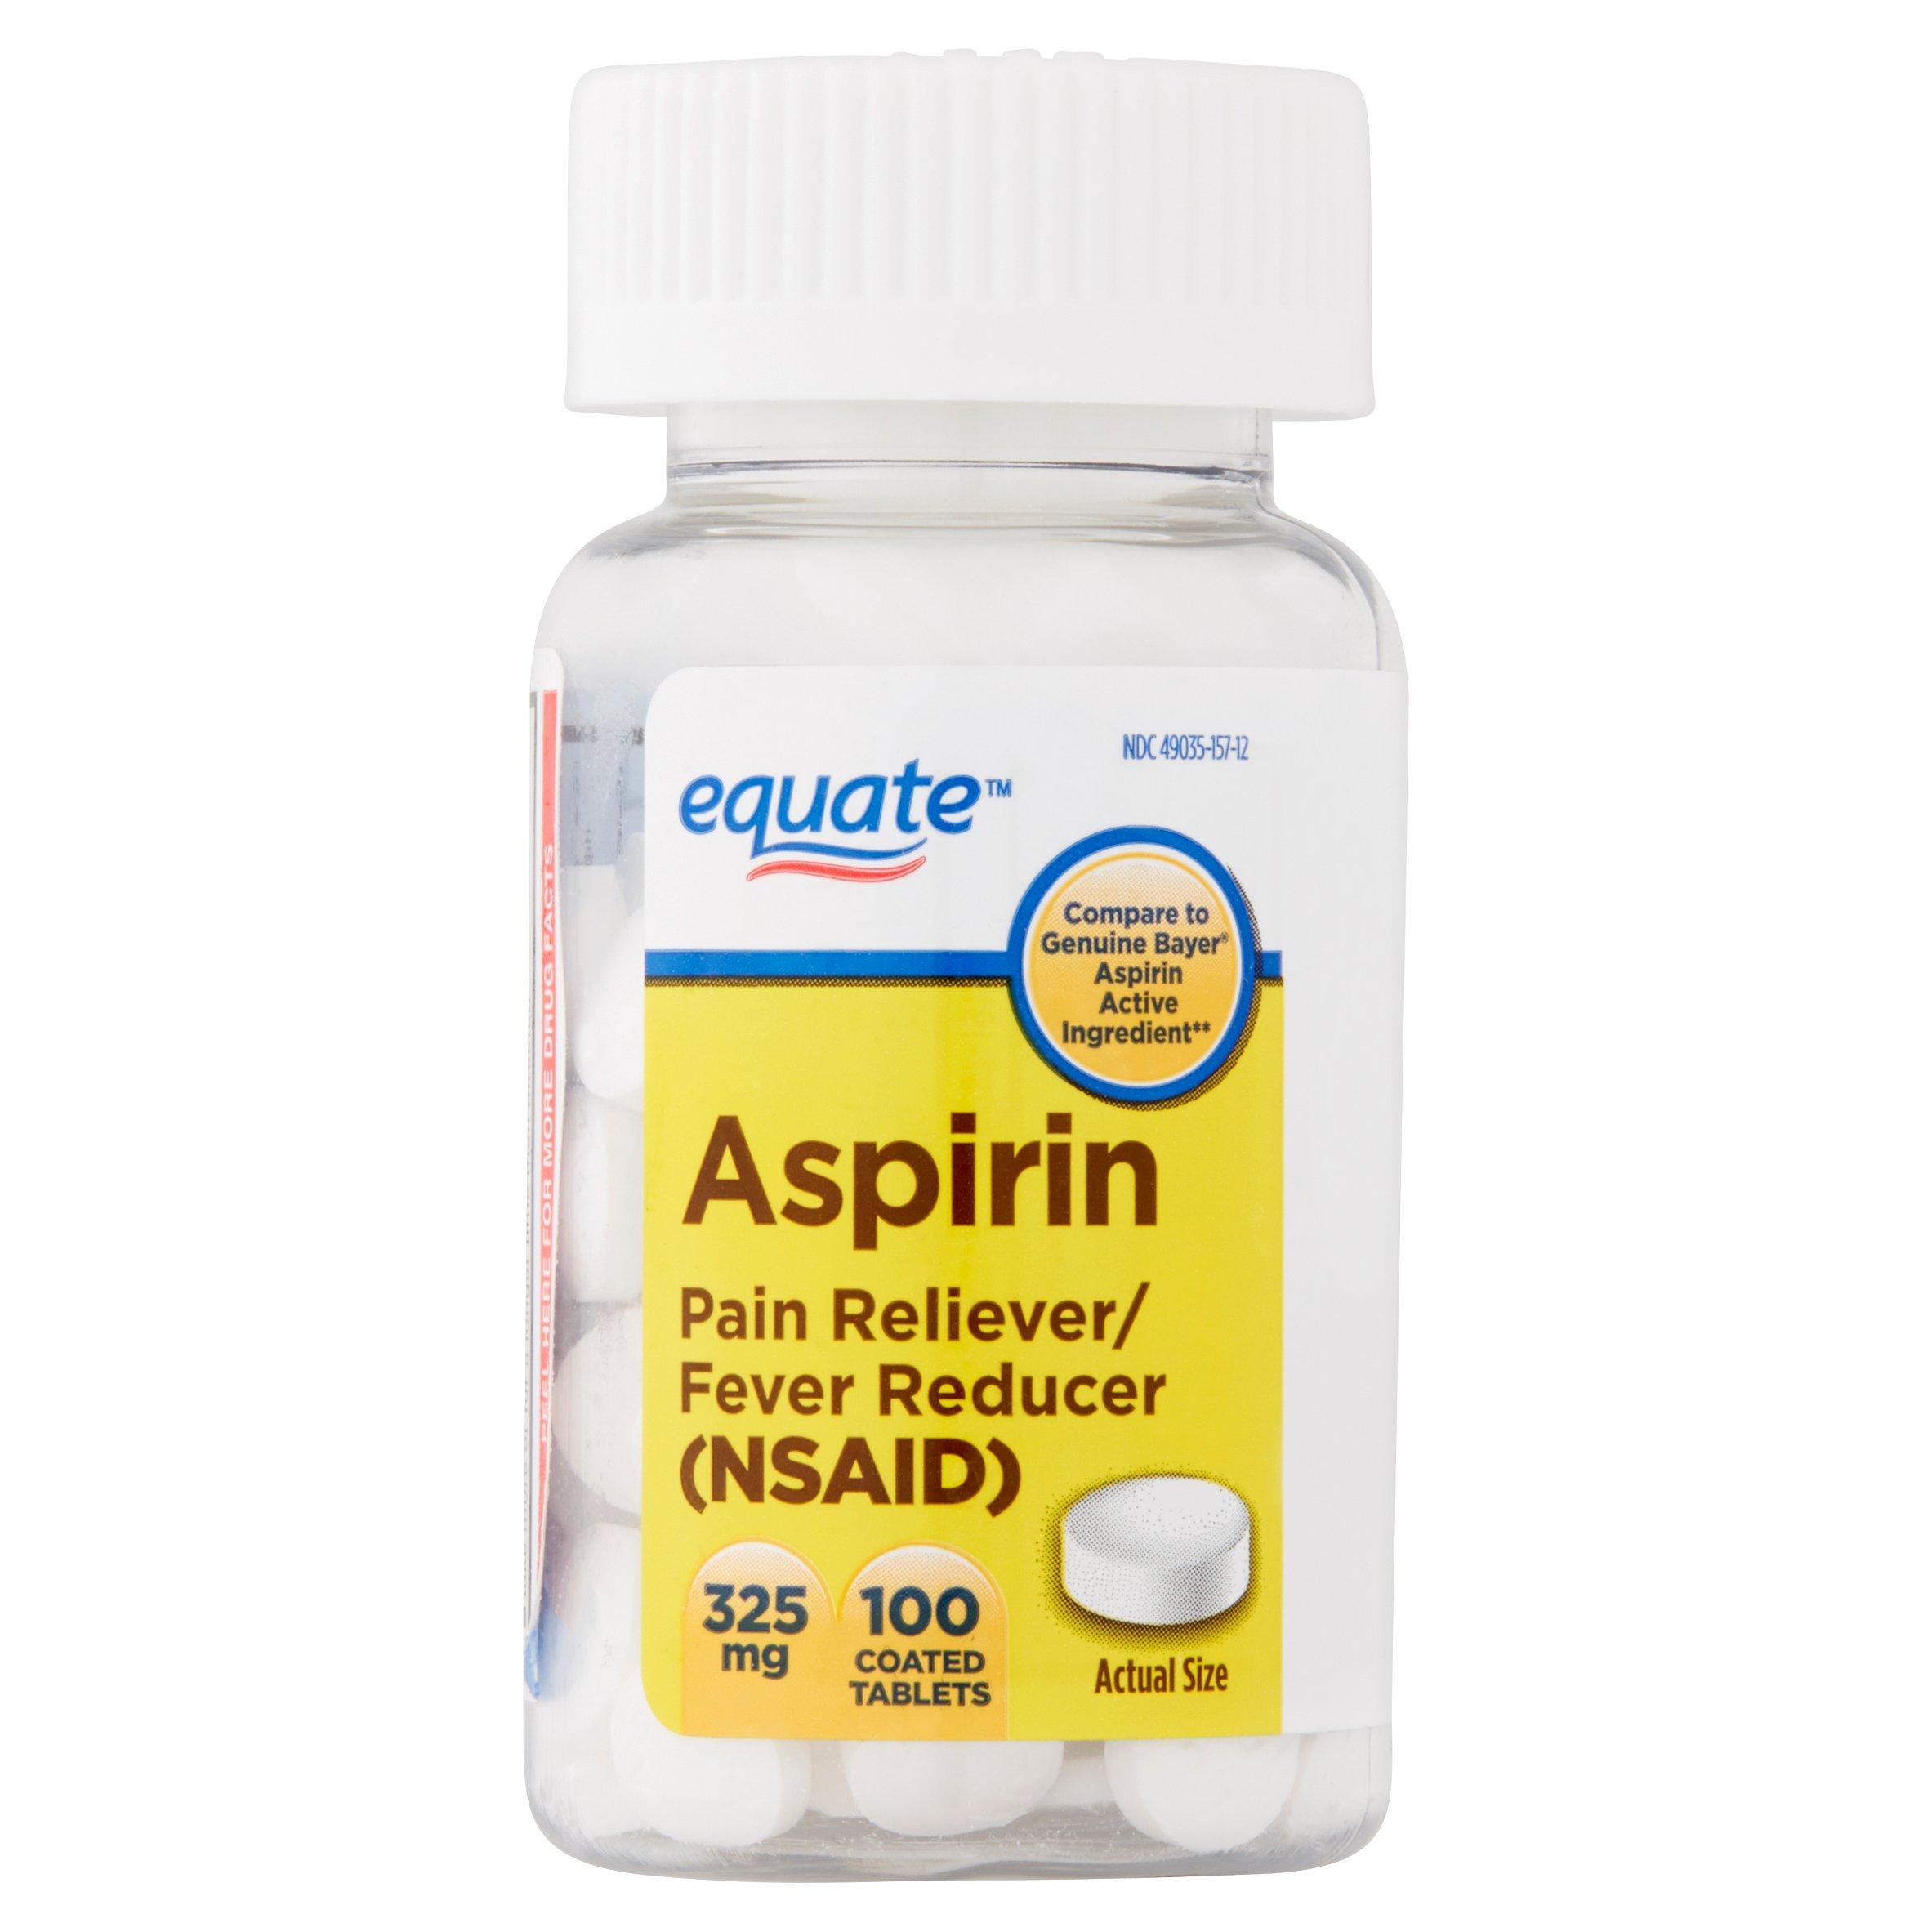 Equate Aspirin Coated Tablets, 325 mg, 100 count - Walmart.com